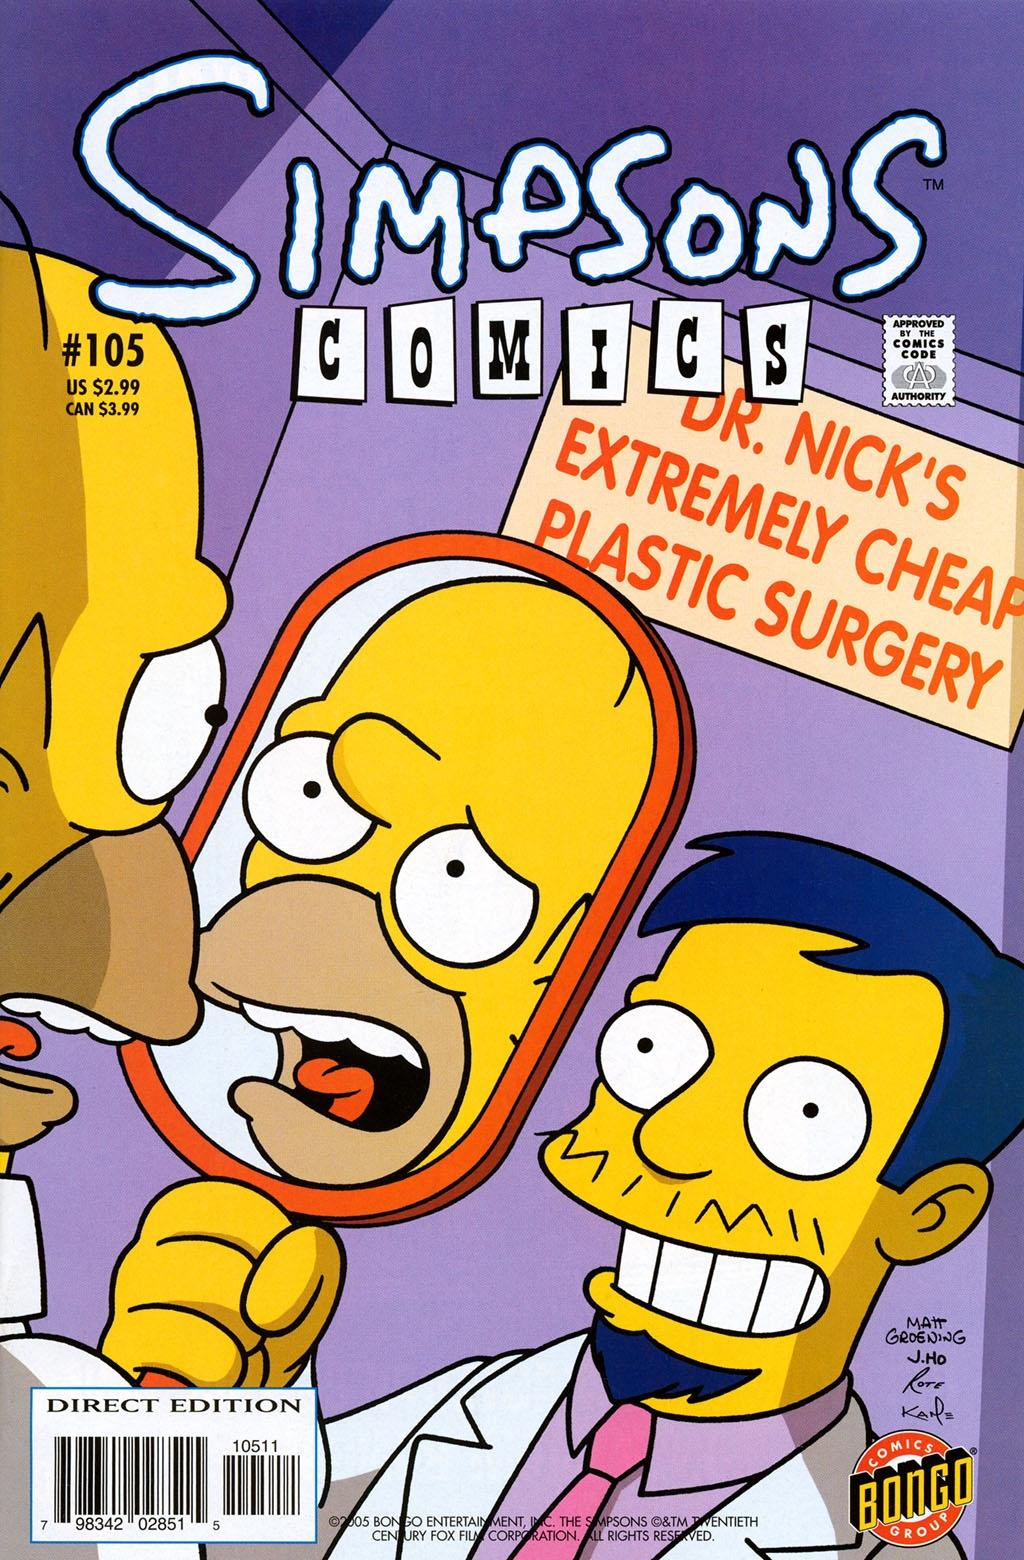 Simpsons Comics 105.jpg